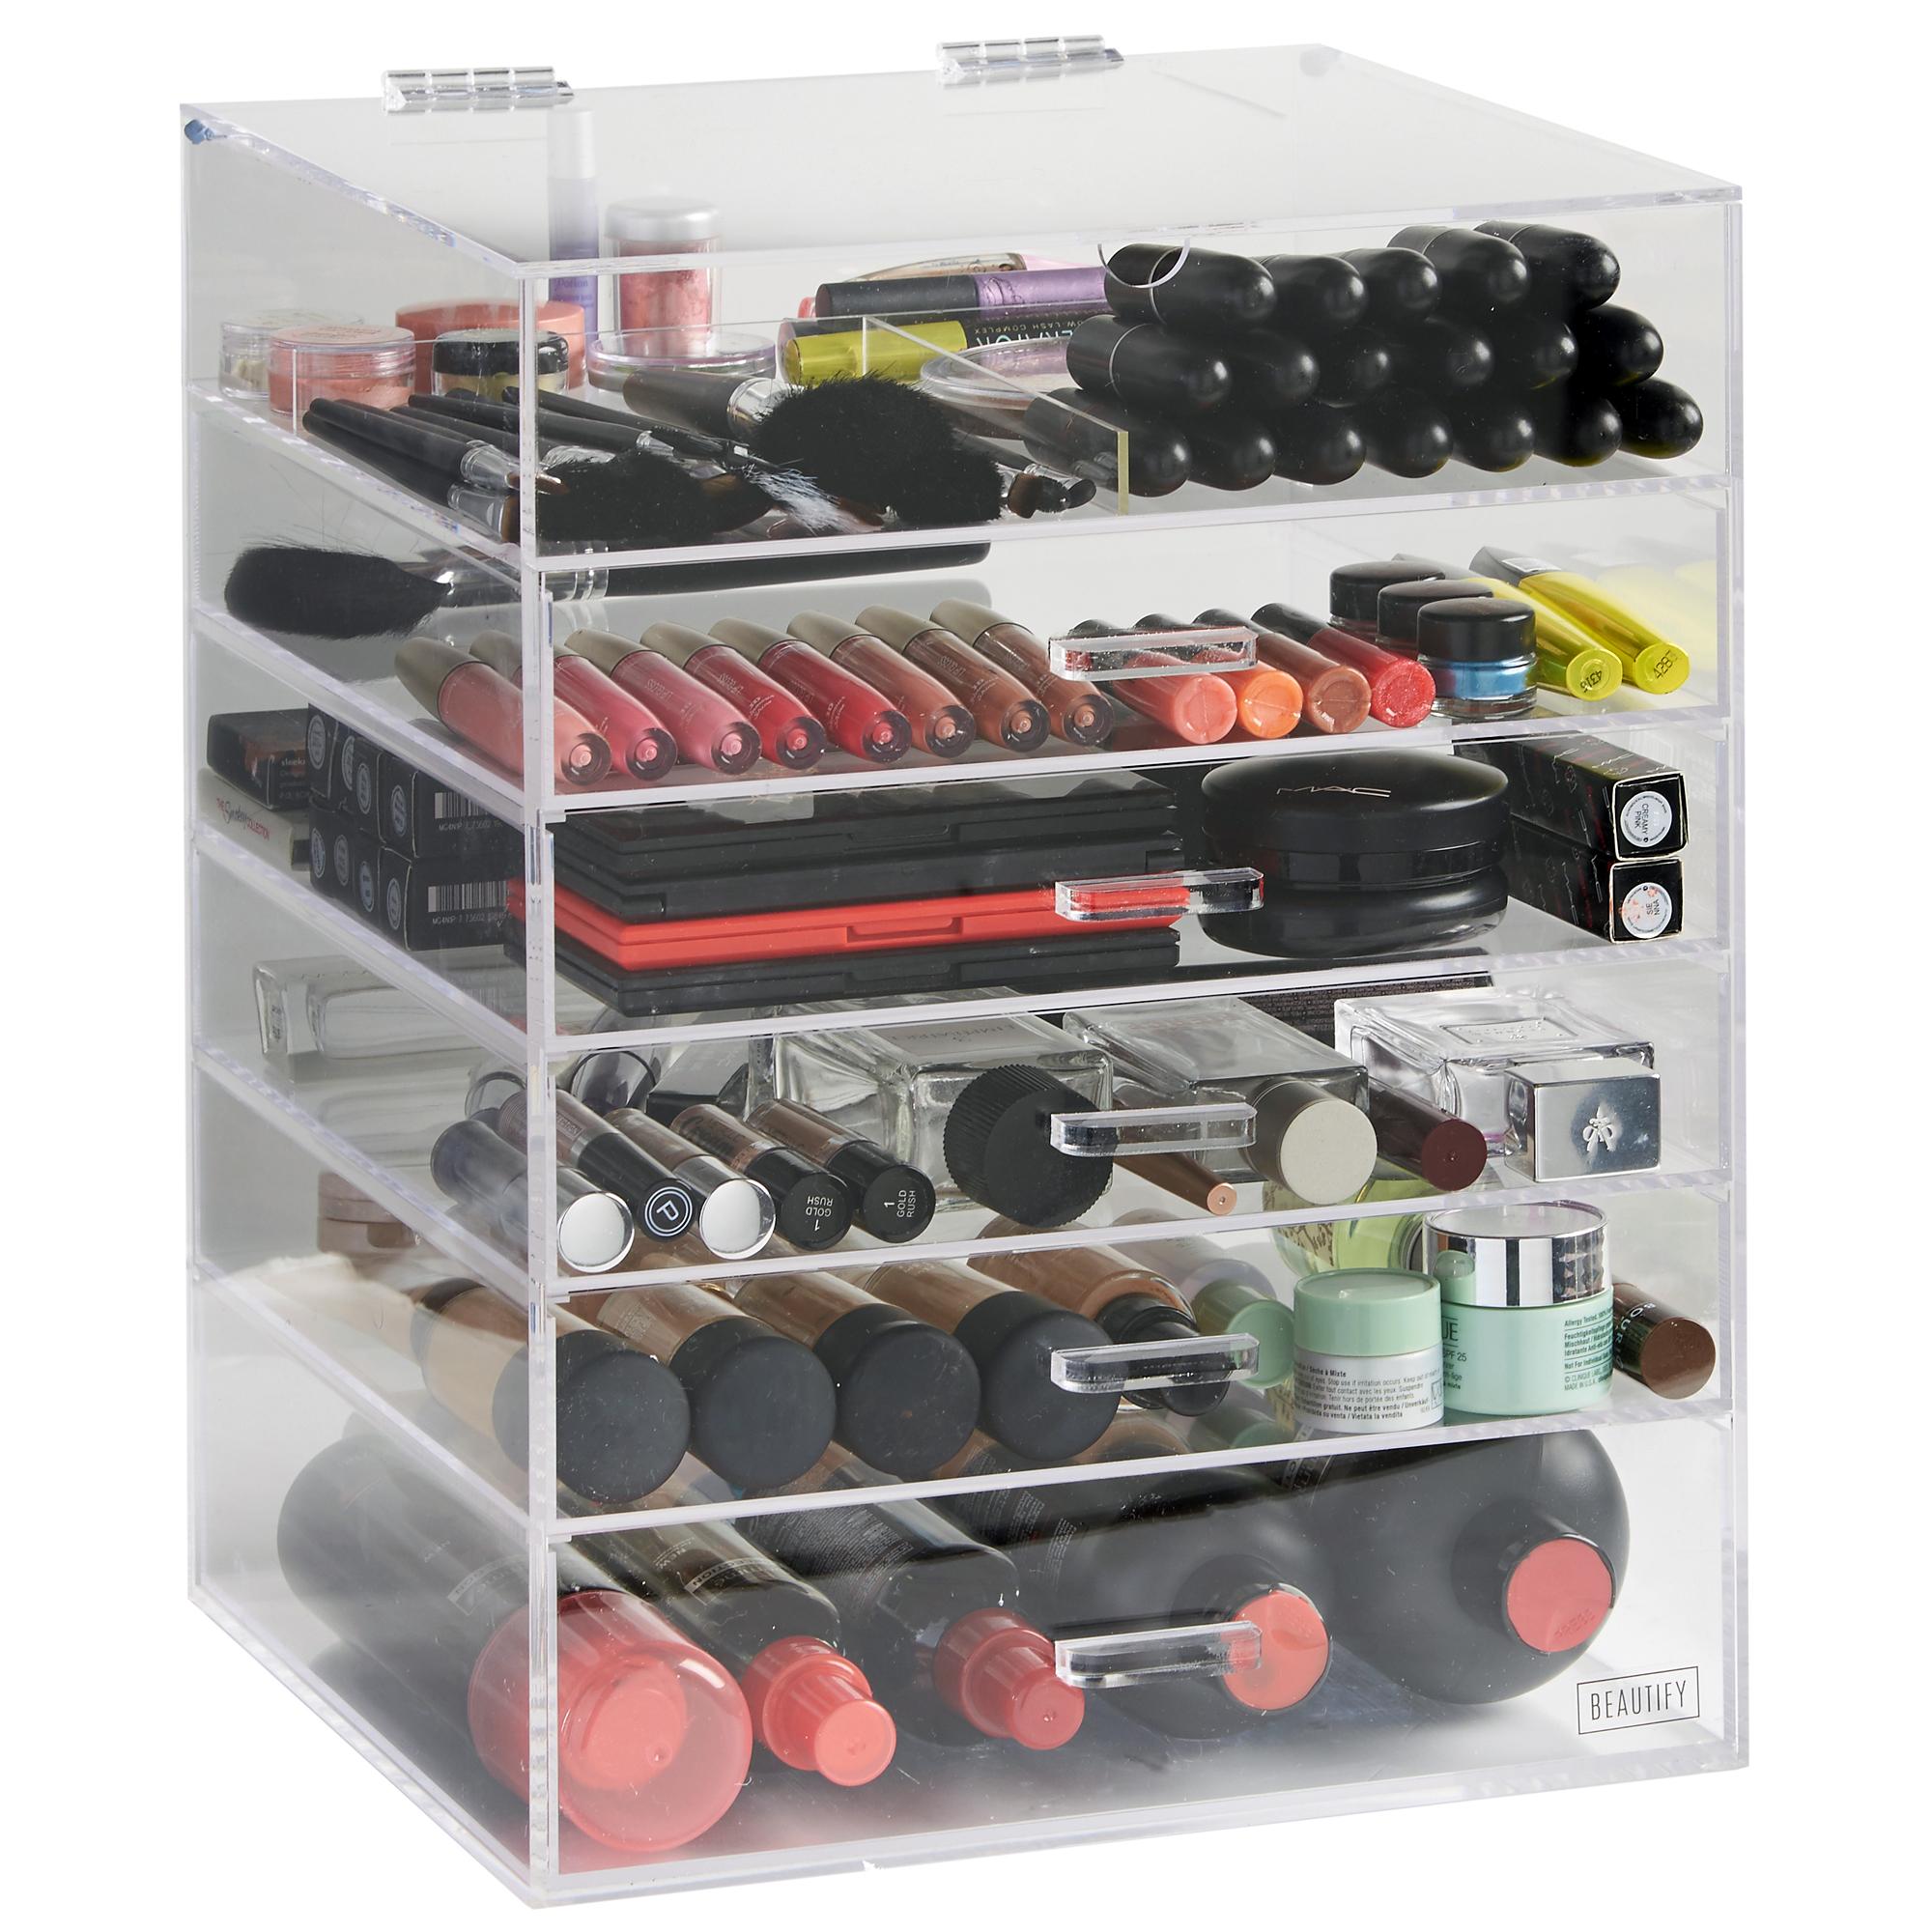 Beautify Large Clear Acrylic Cosmetic Makeup Jewelry Storage Cube Organizer  Case. Acrylic Makeup Organizer   eBay